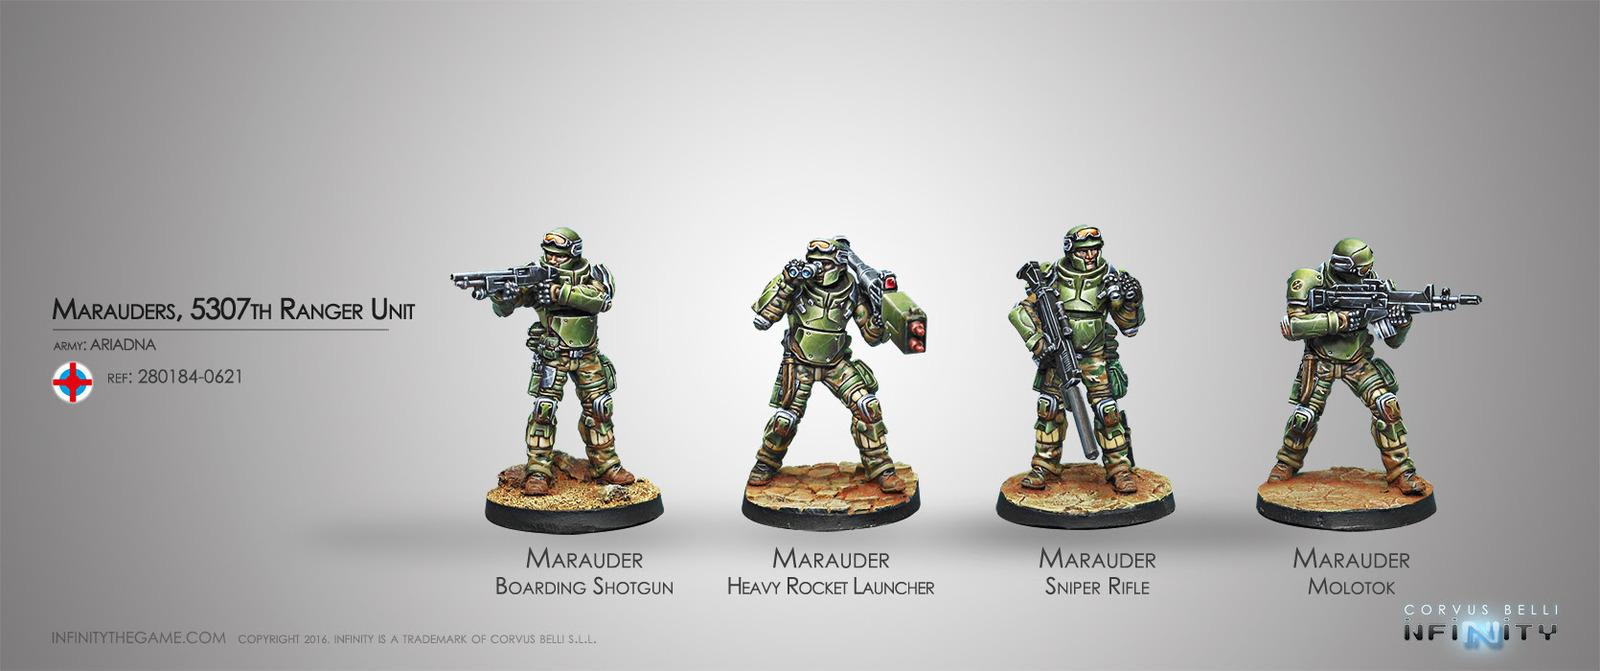 Infinity: Marauders, 5307th Ranger Unit image